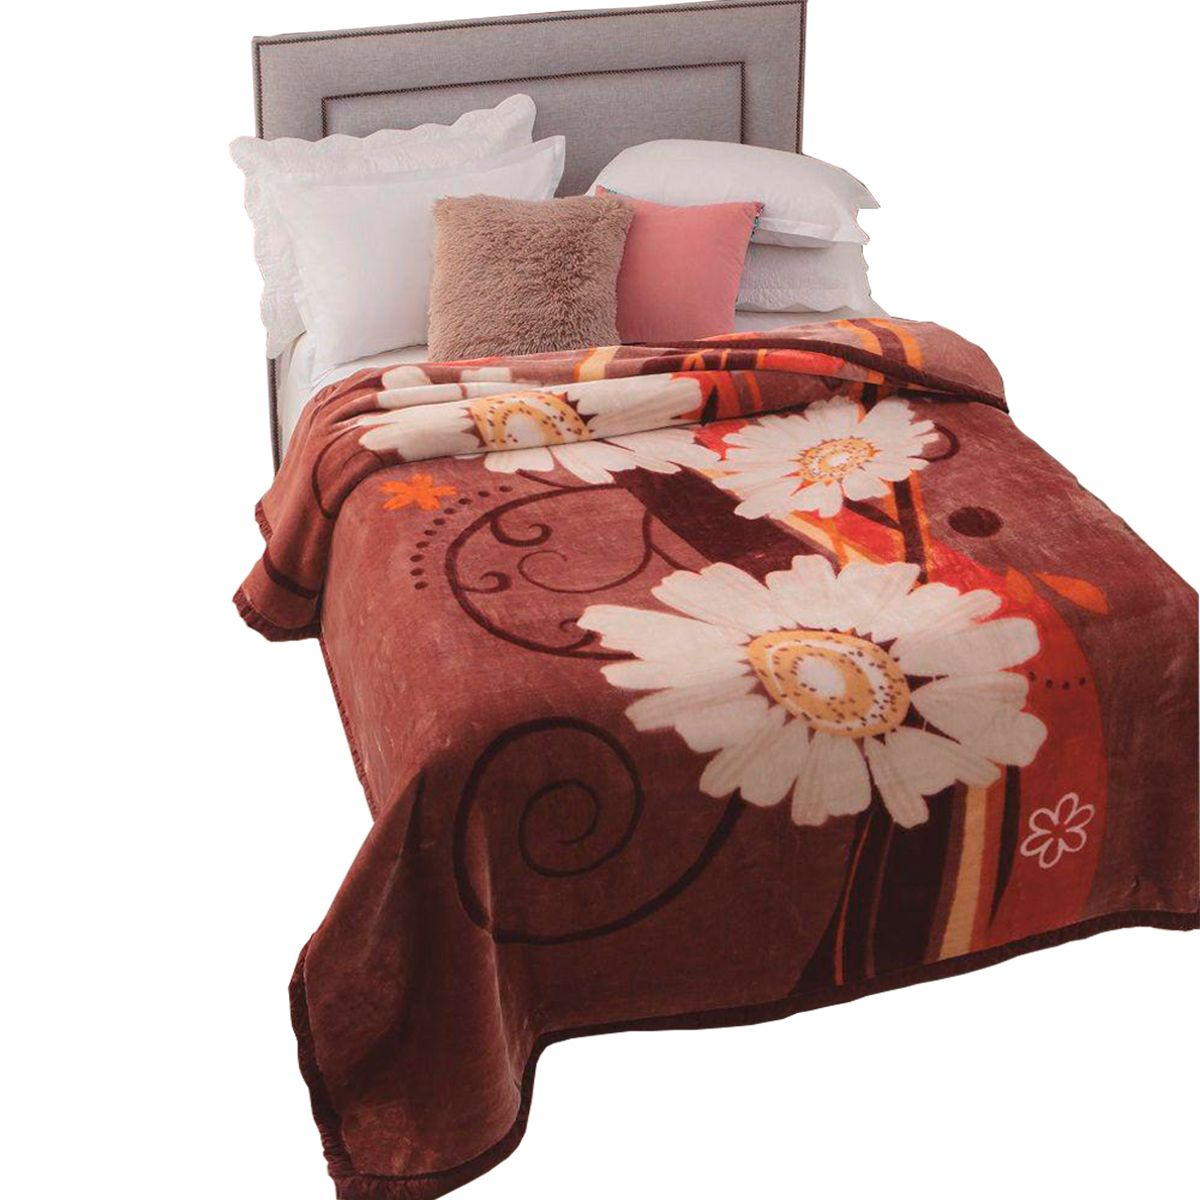 Cobertor Raschel Plus Casal Poliester Caster 180x220cm